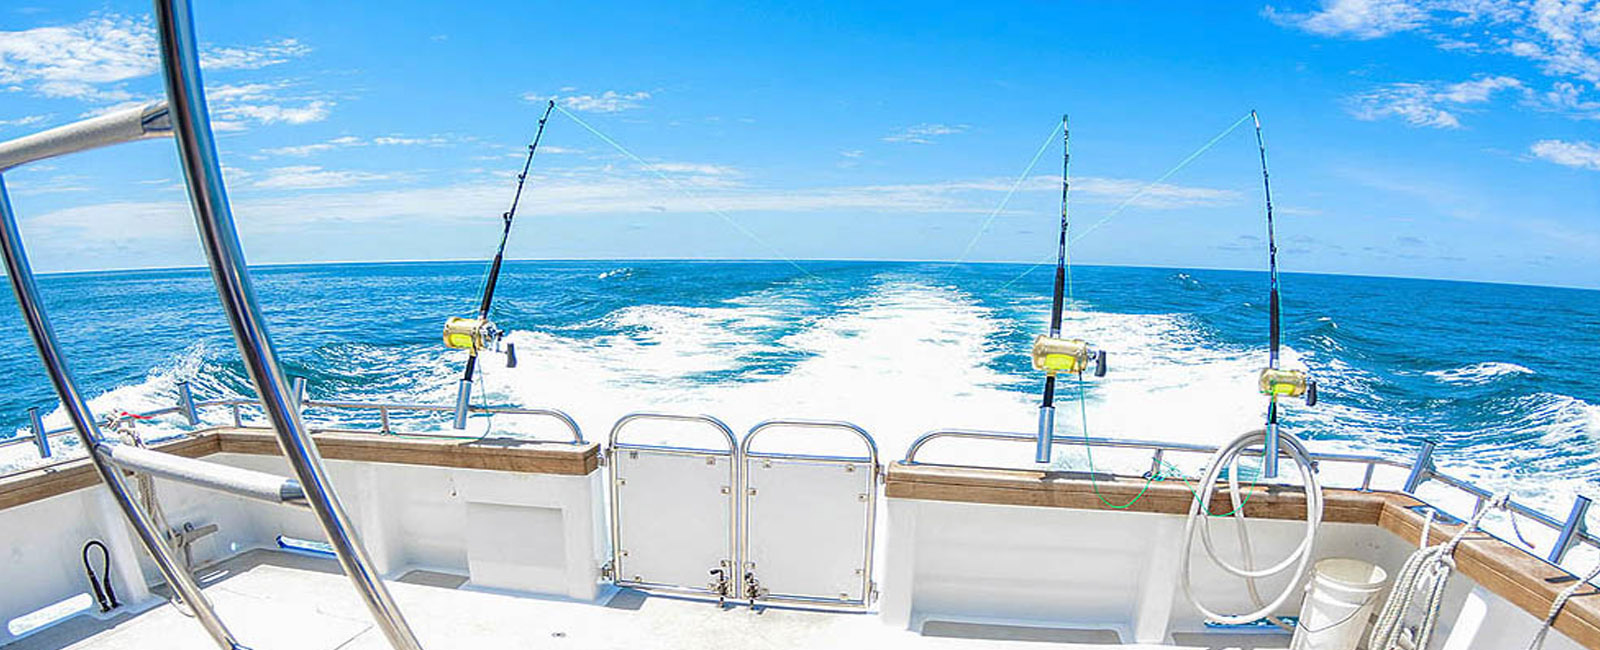 Glenalan-fishing-rods-Abrolhos-Islands-fishing-trips-charters-1